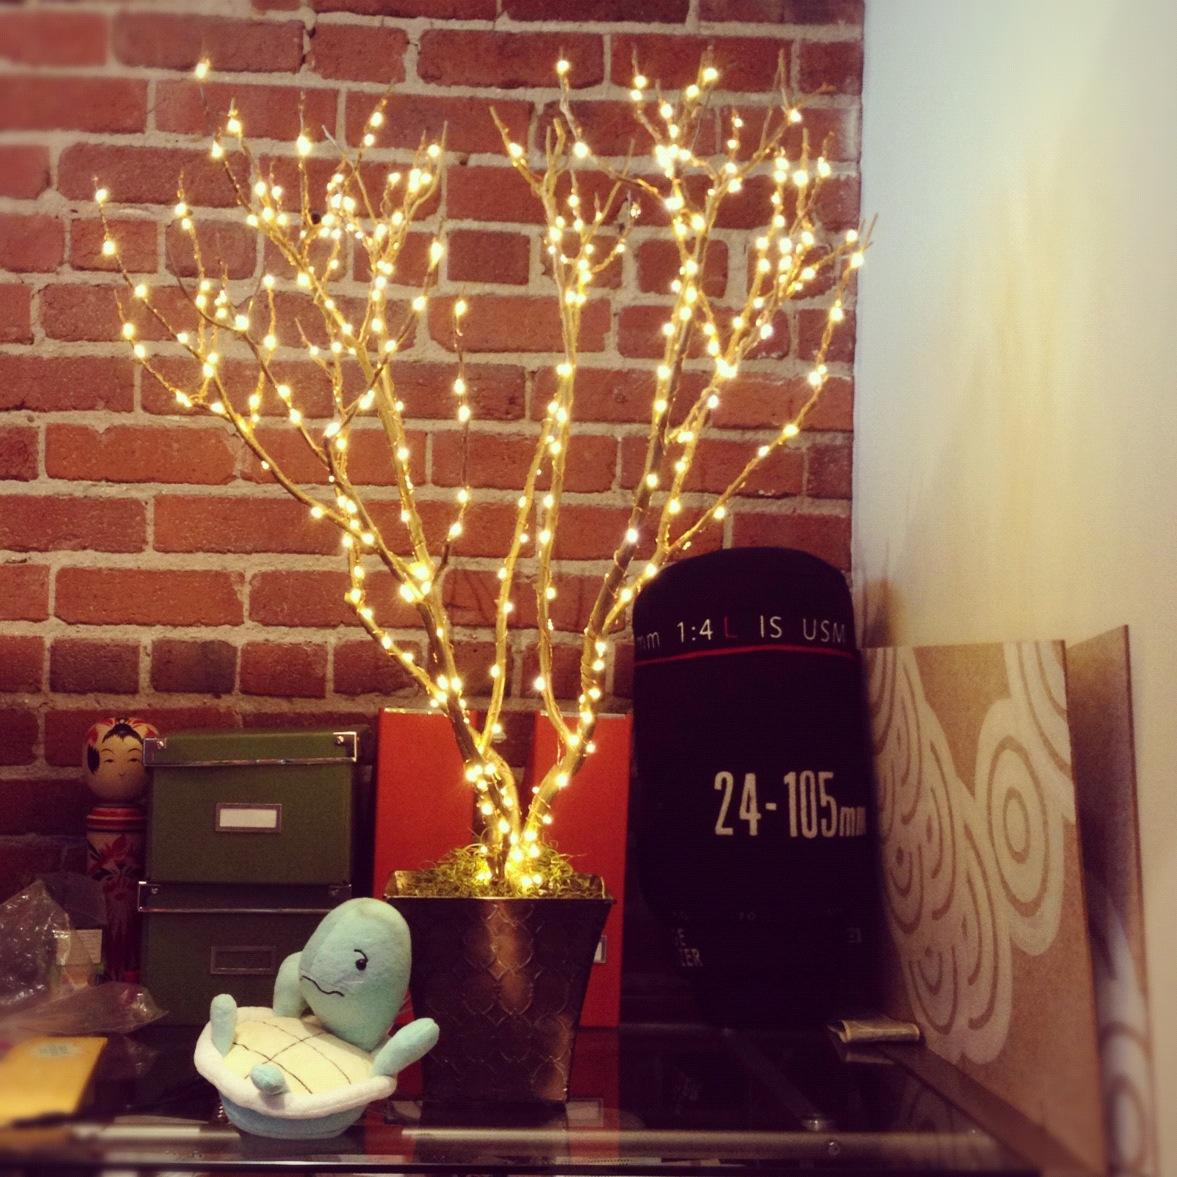 Rachel 39 s celebright holiday led lights tree decor - Led lights decoration ideas ...